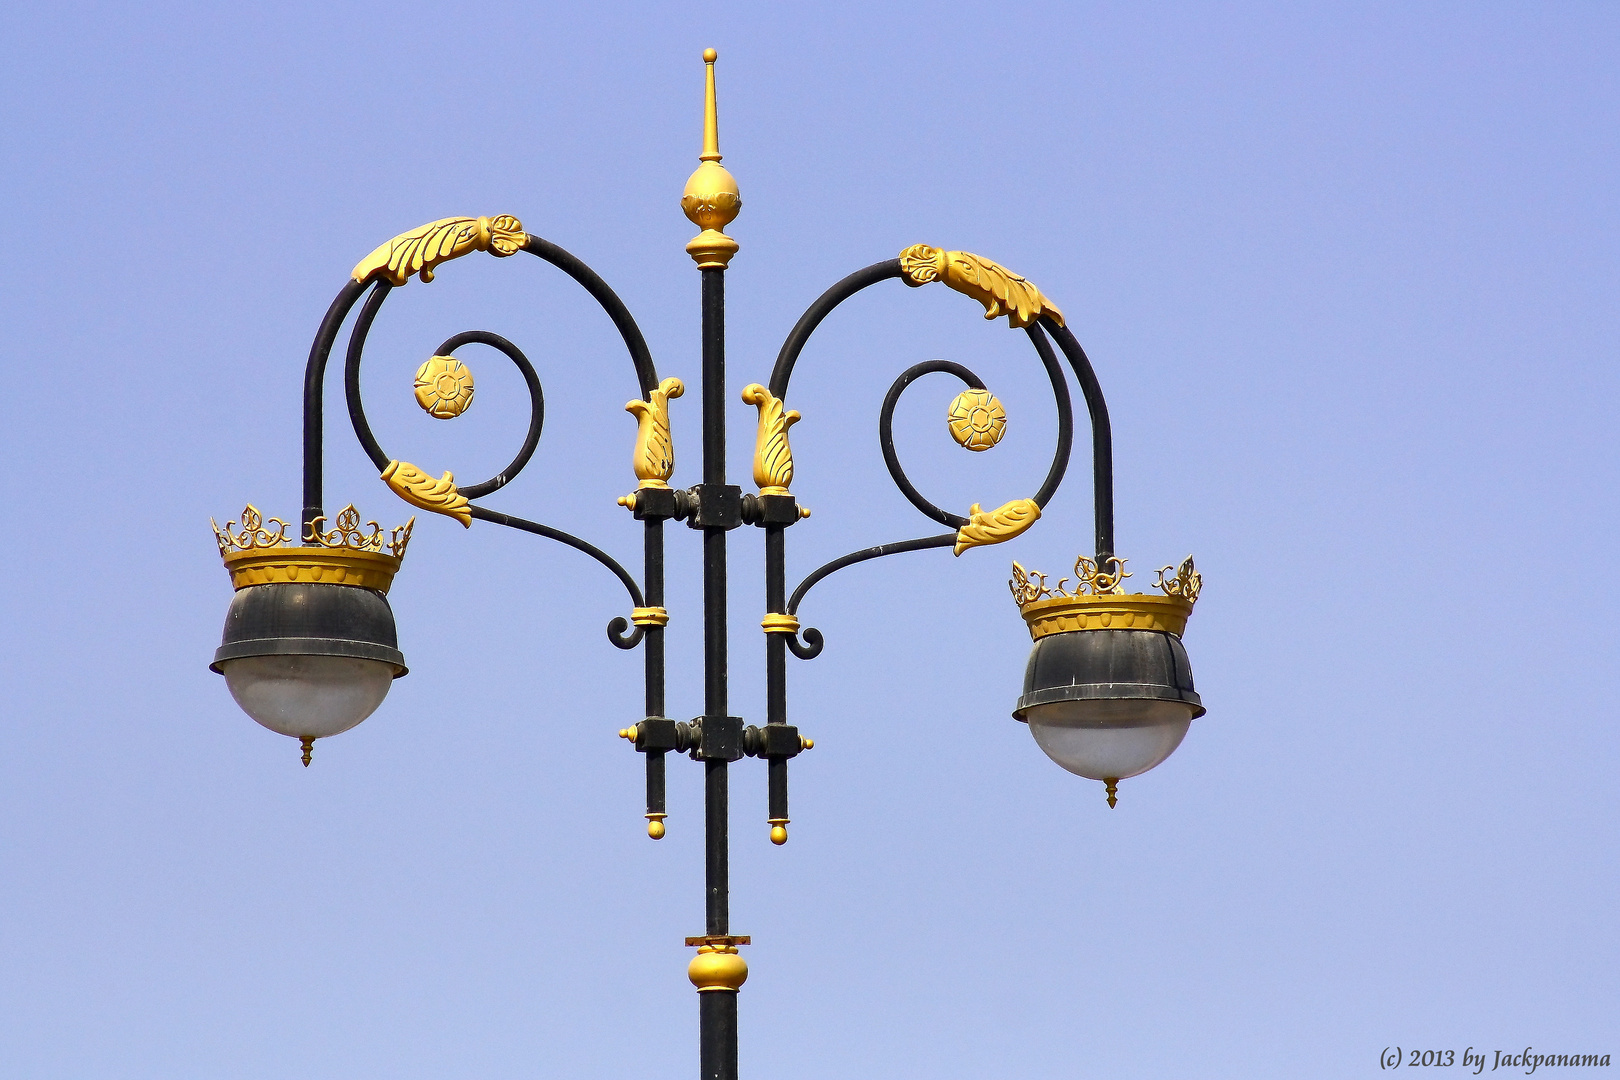 vergoldete Straßenlampe am Port Sultan Quaboos (im Oman)